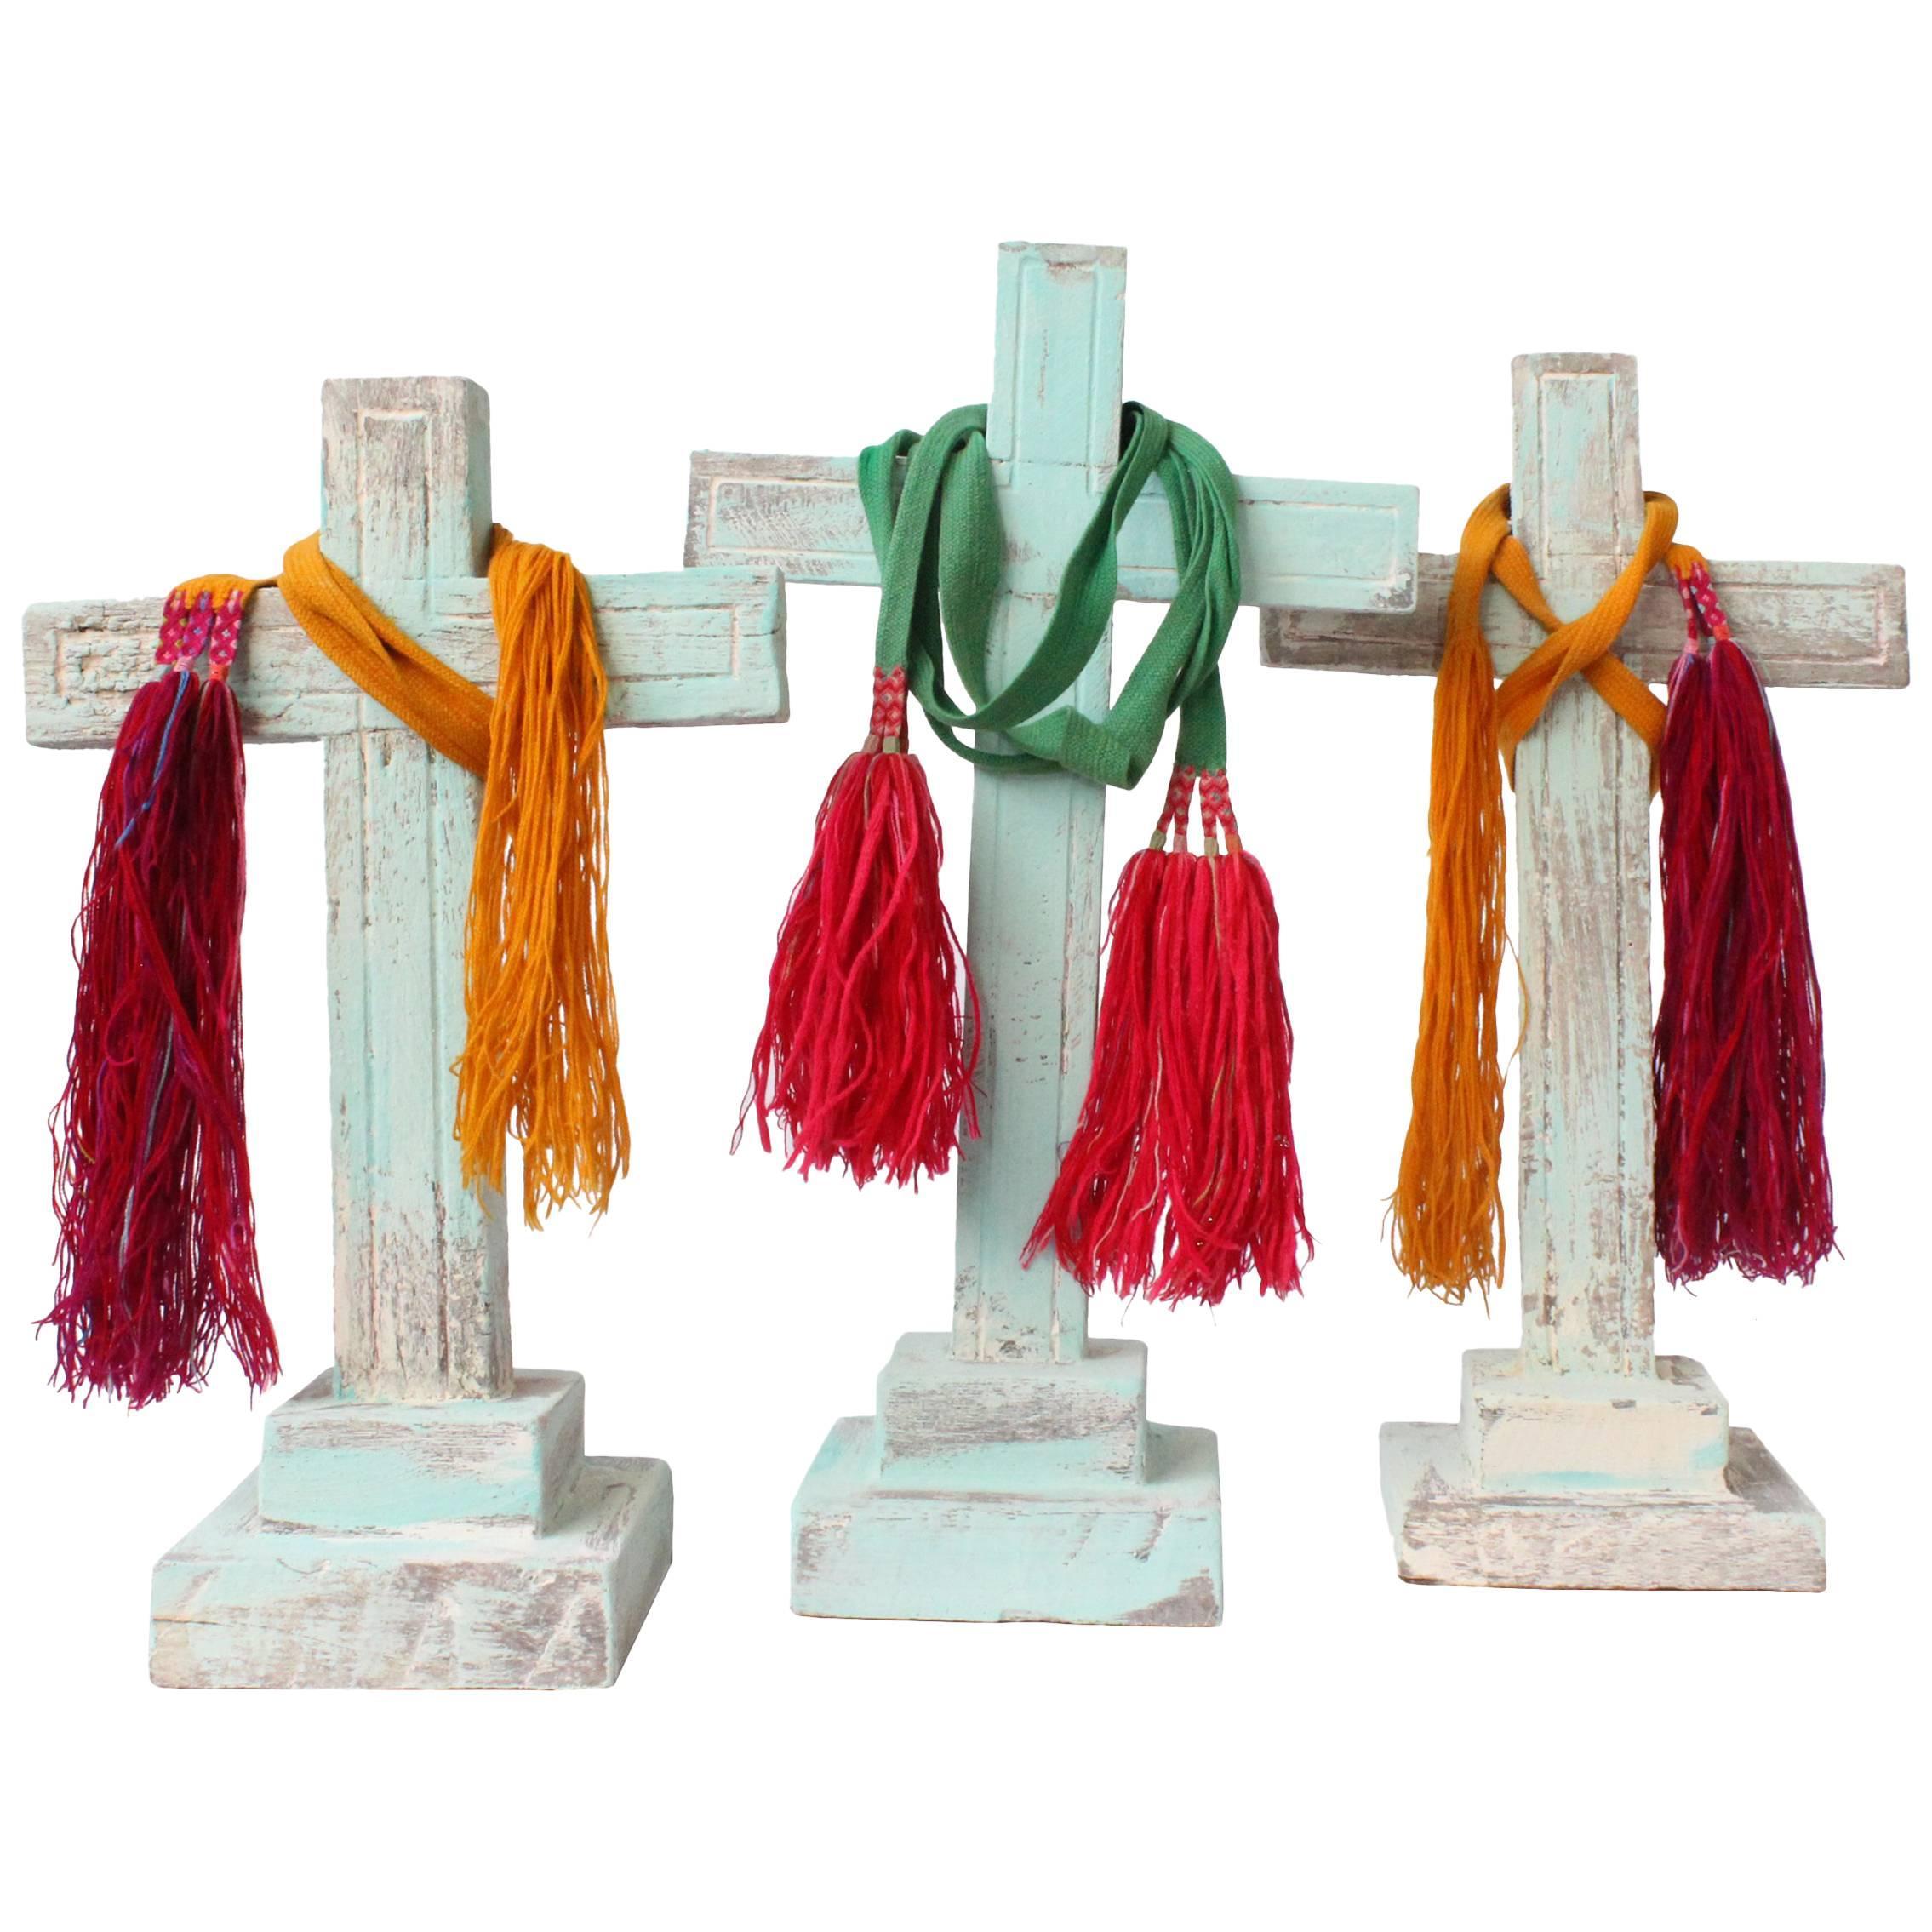 Set of Three Mesquite Wood Crosses Found in Zacatecas, circa 1900